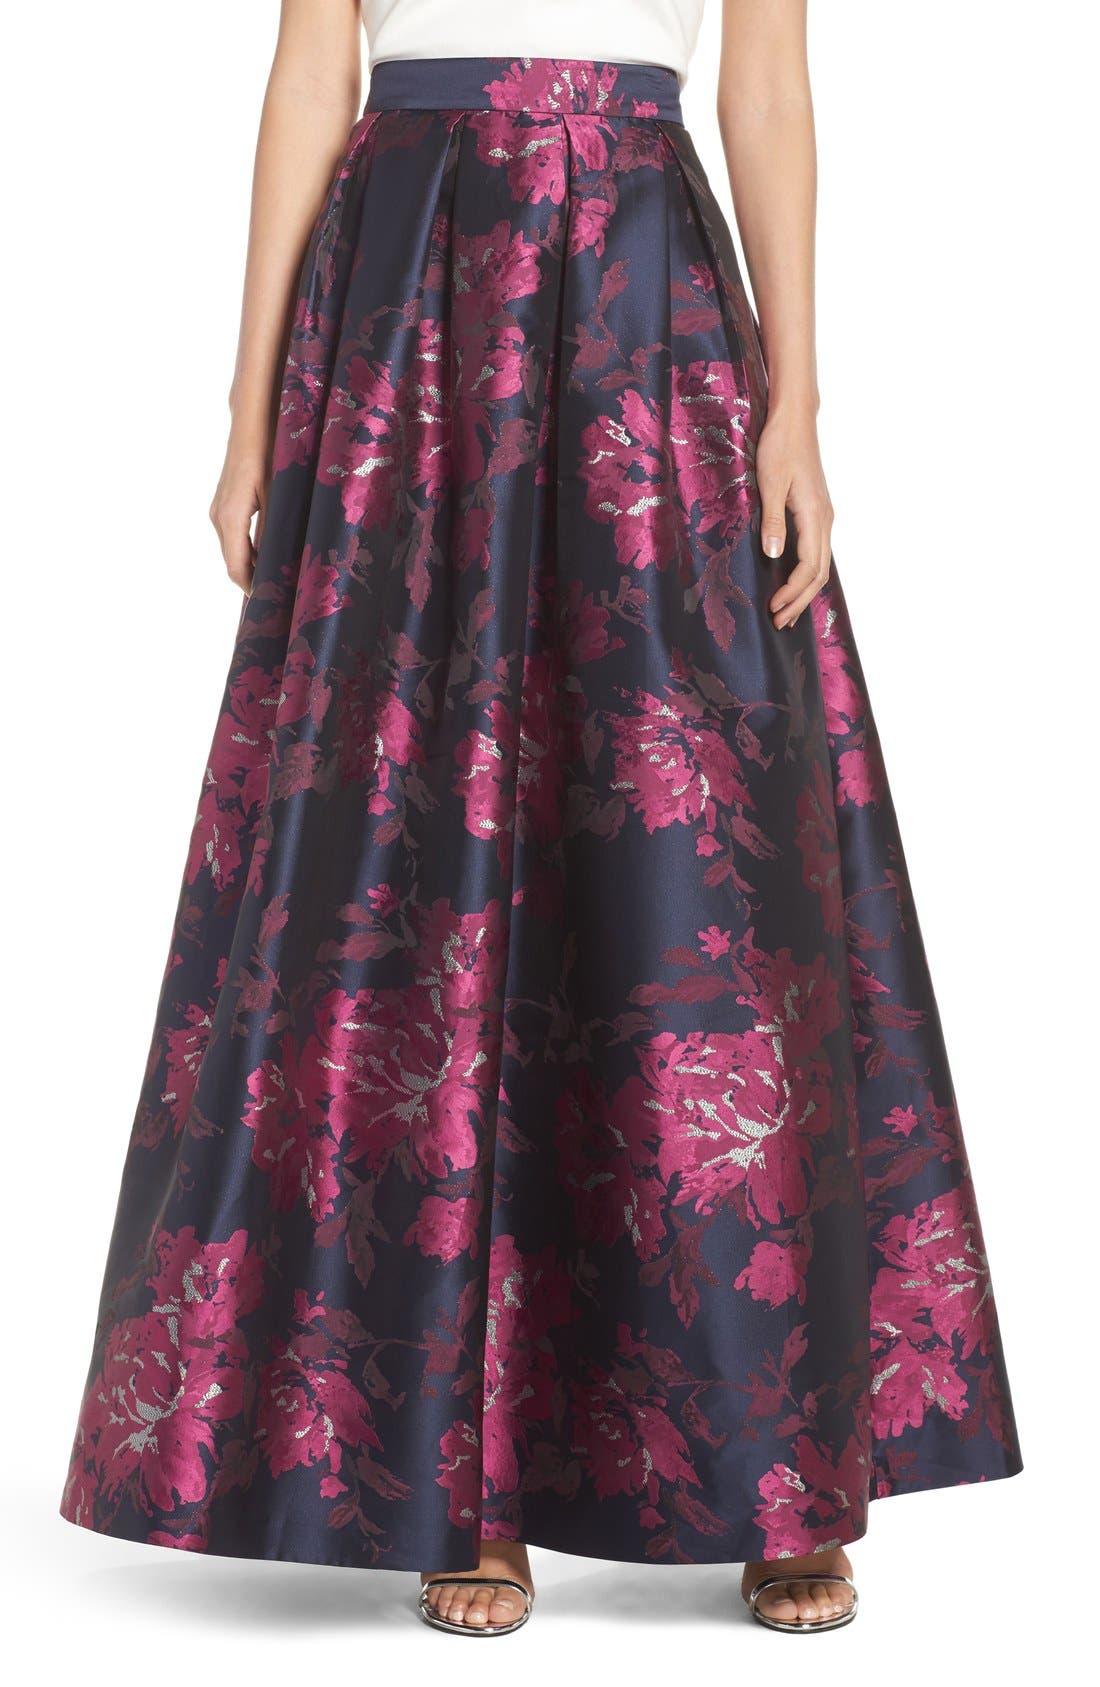 Alternate Image 1 Selected - Eliza J Metallic Jacquard Ball Skirt